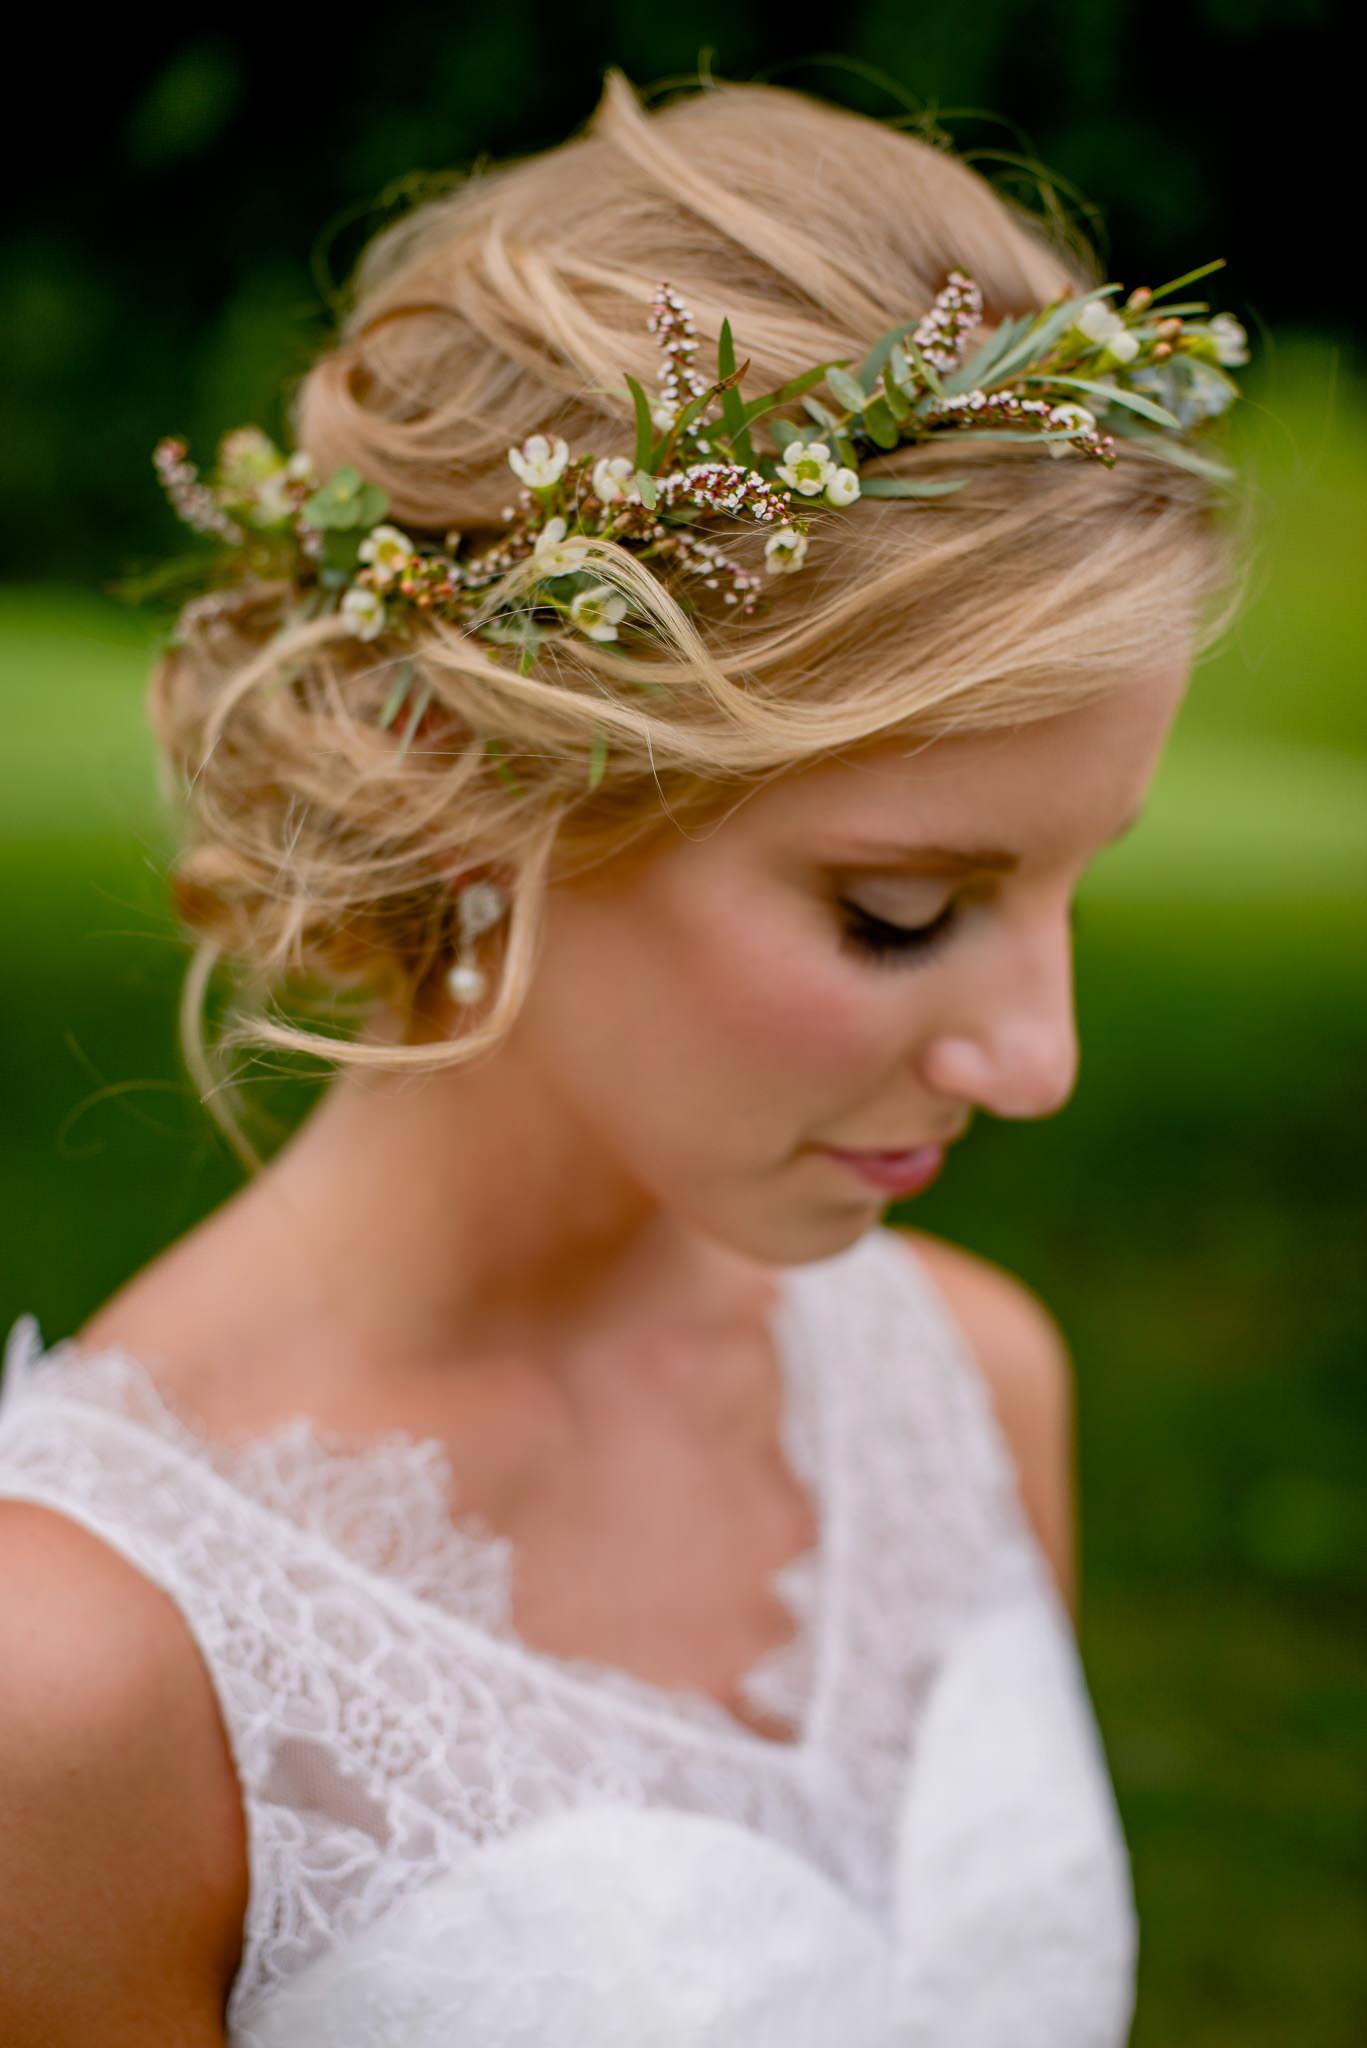 Greg and Jess Photography Nashville Portrait and Wedding Photographer 38.jpg